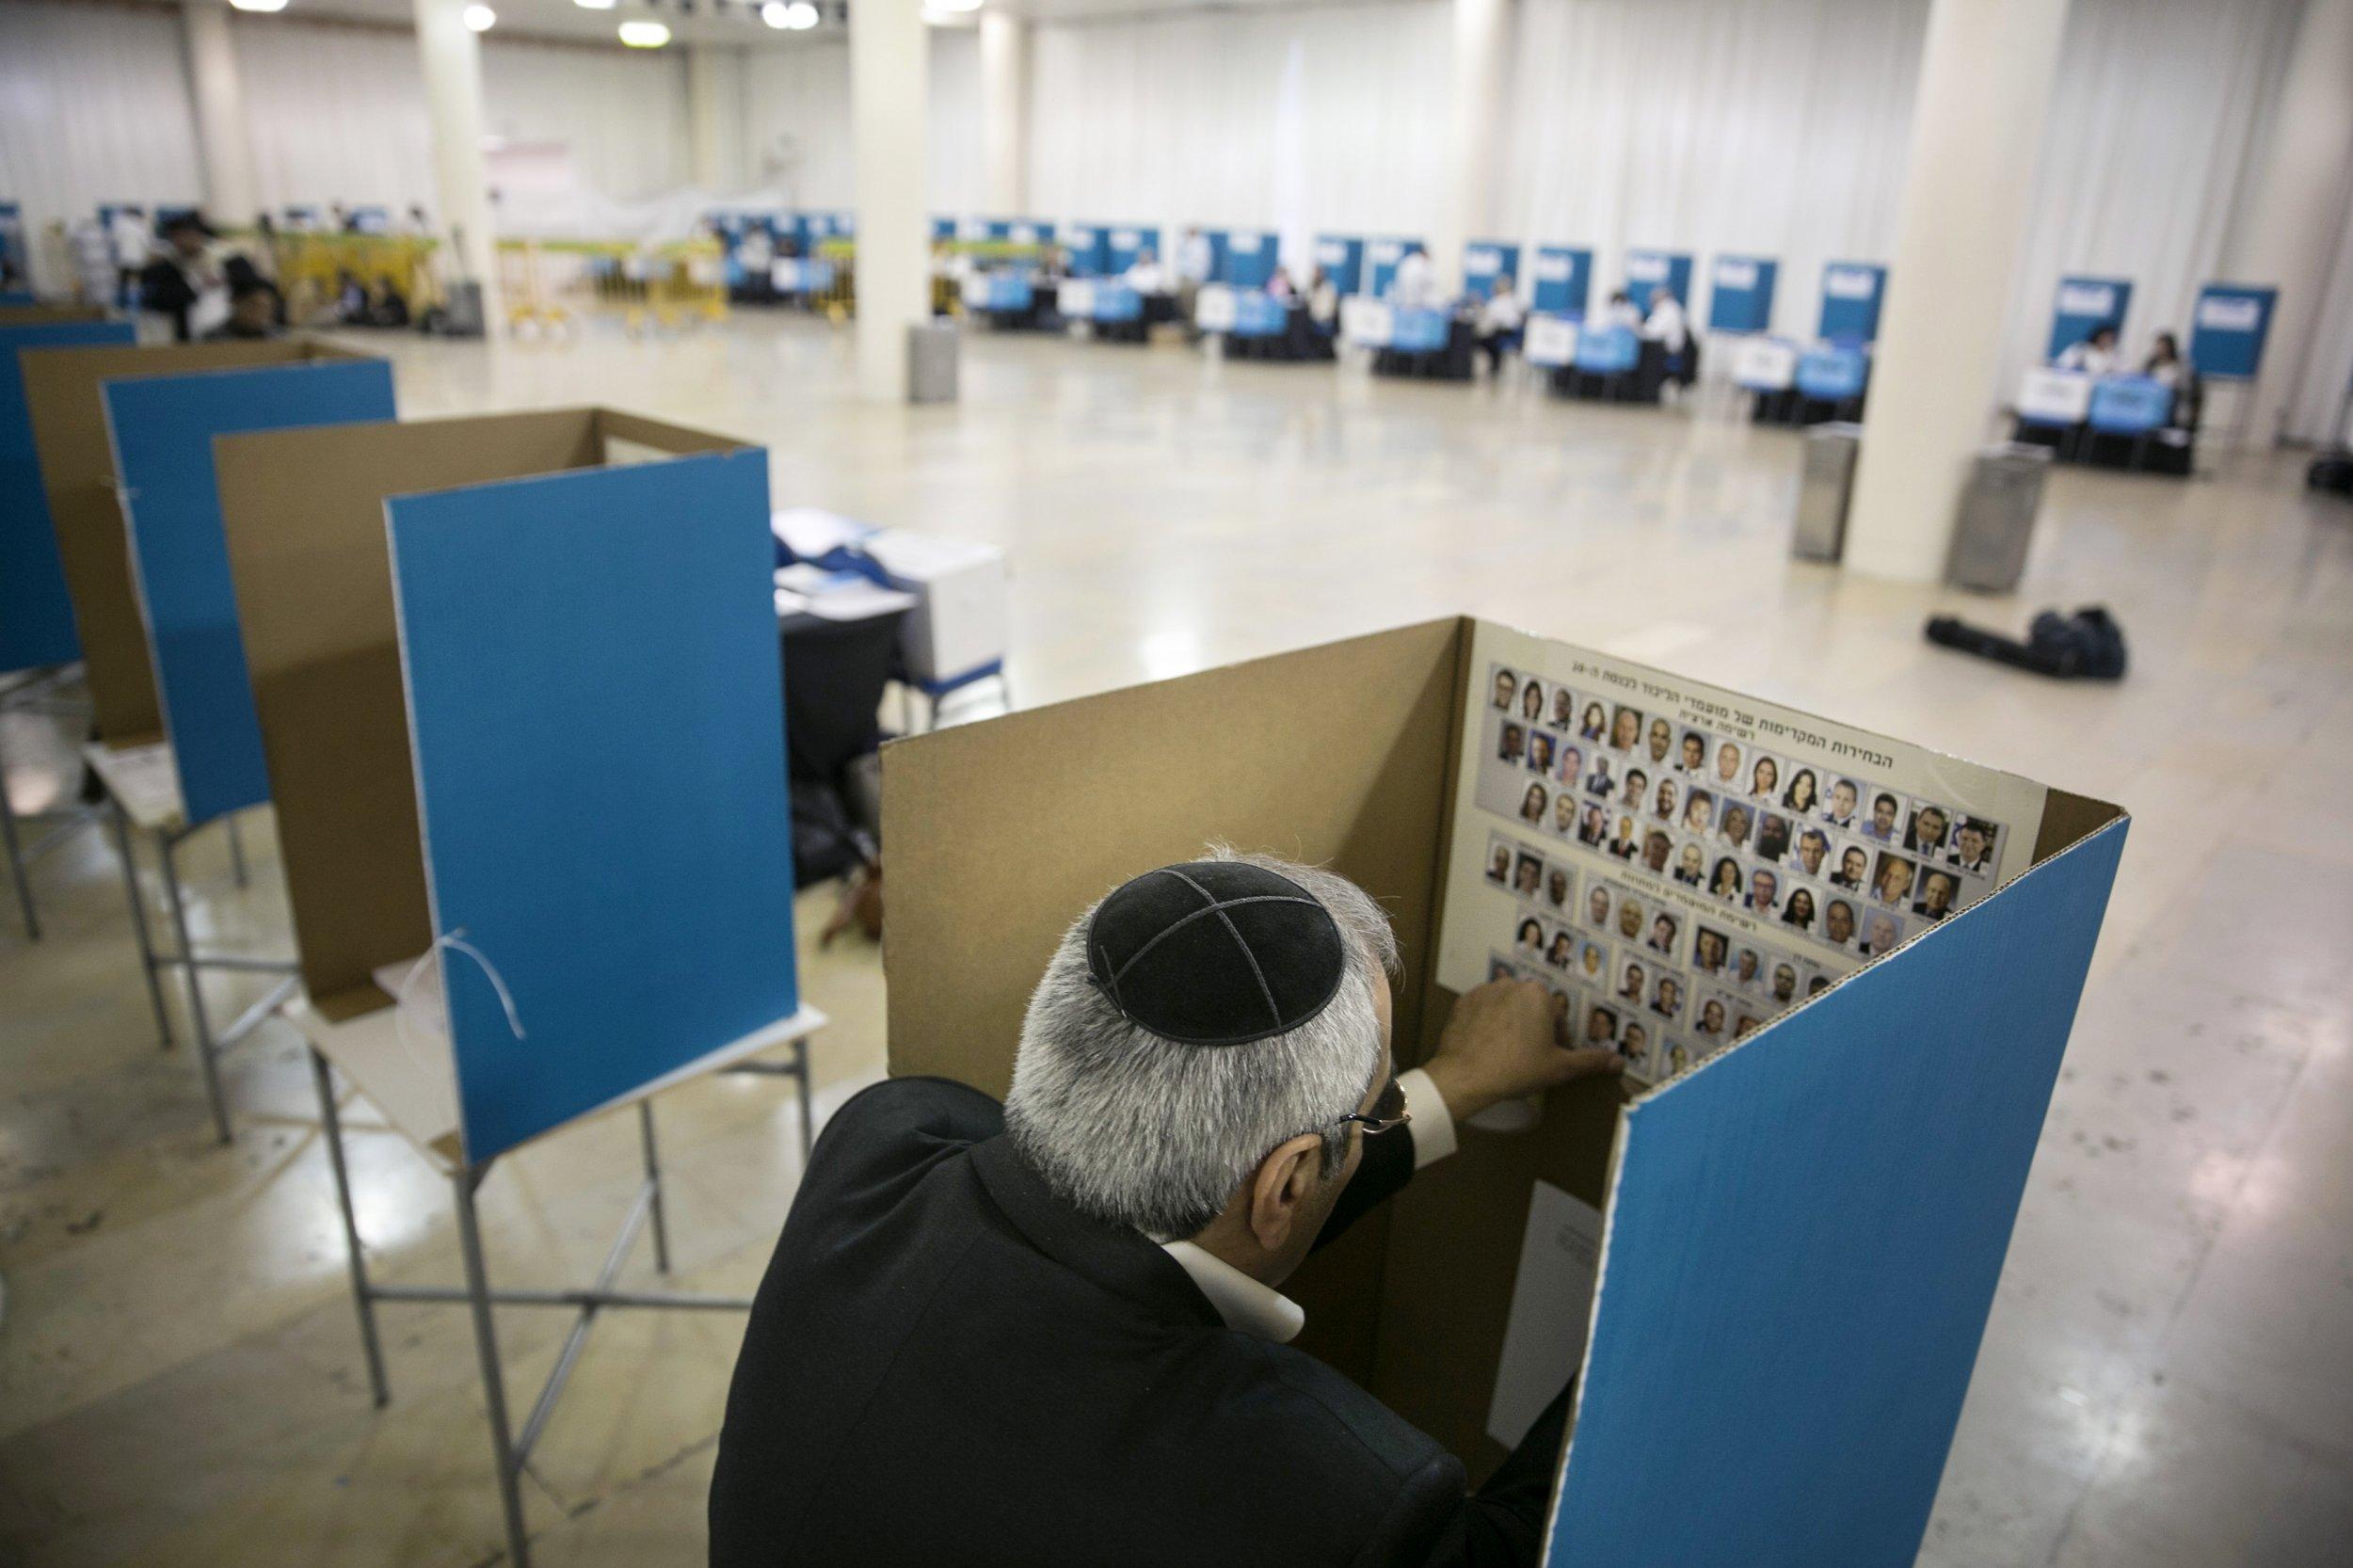 israel election - HD1440×960